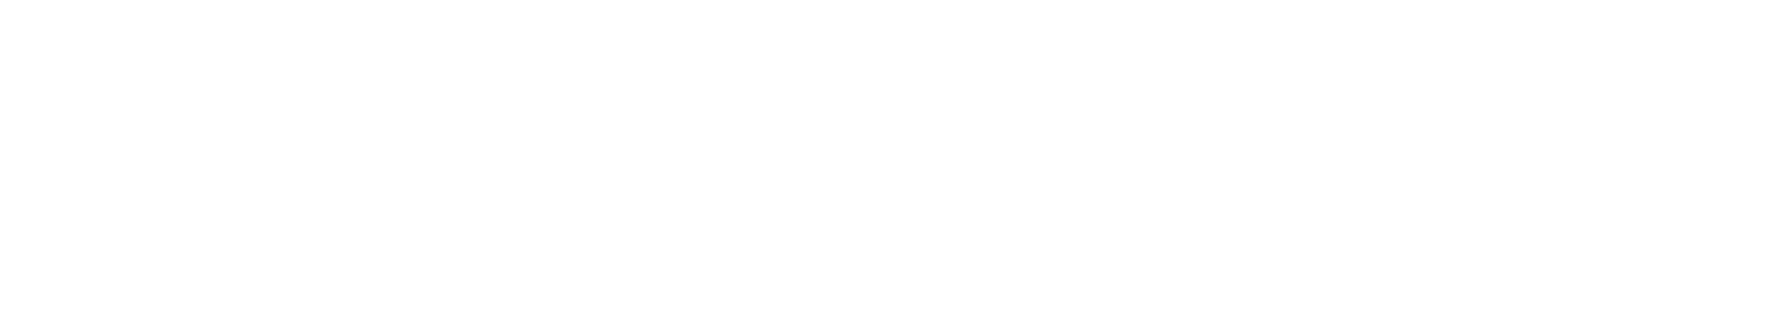 logo-Praktijk-Bart-Boele-witkopie